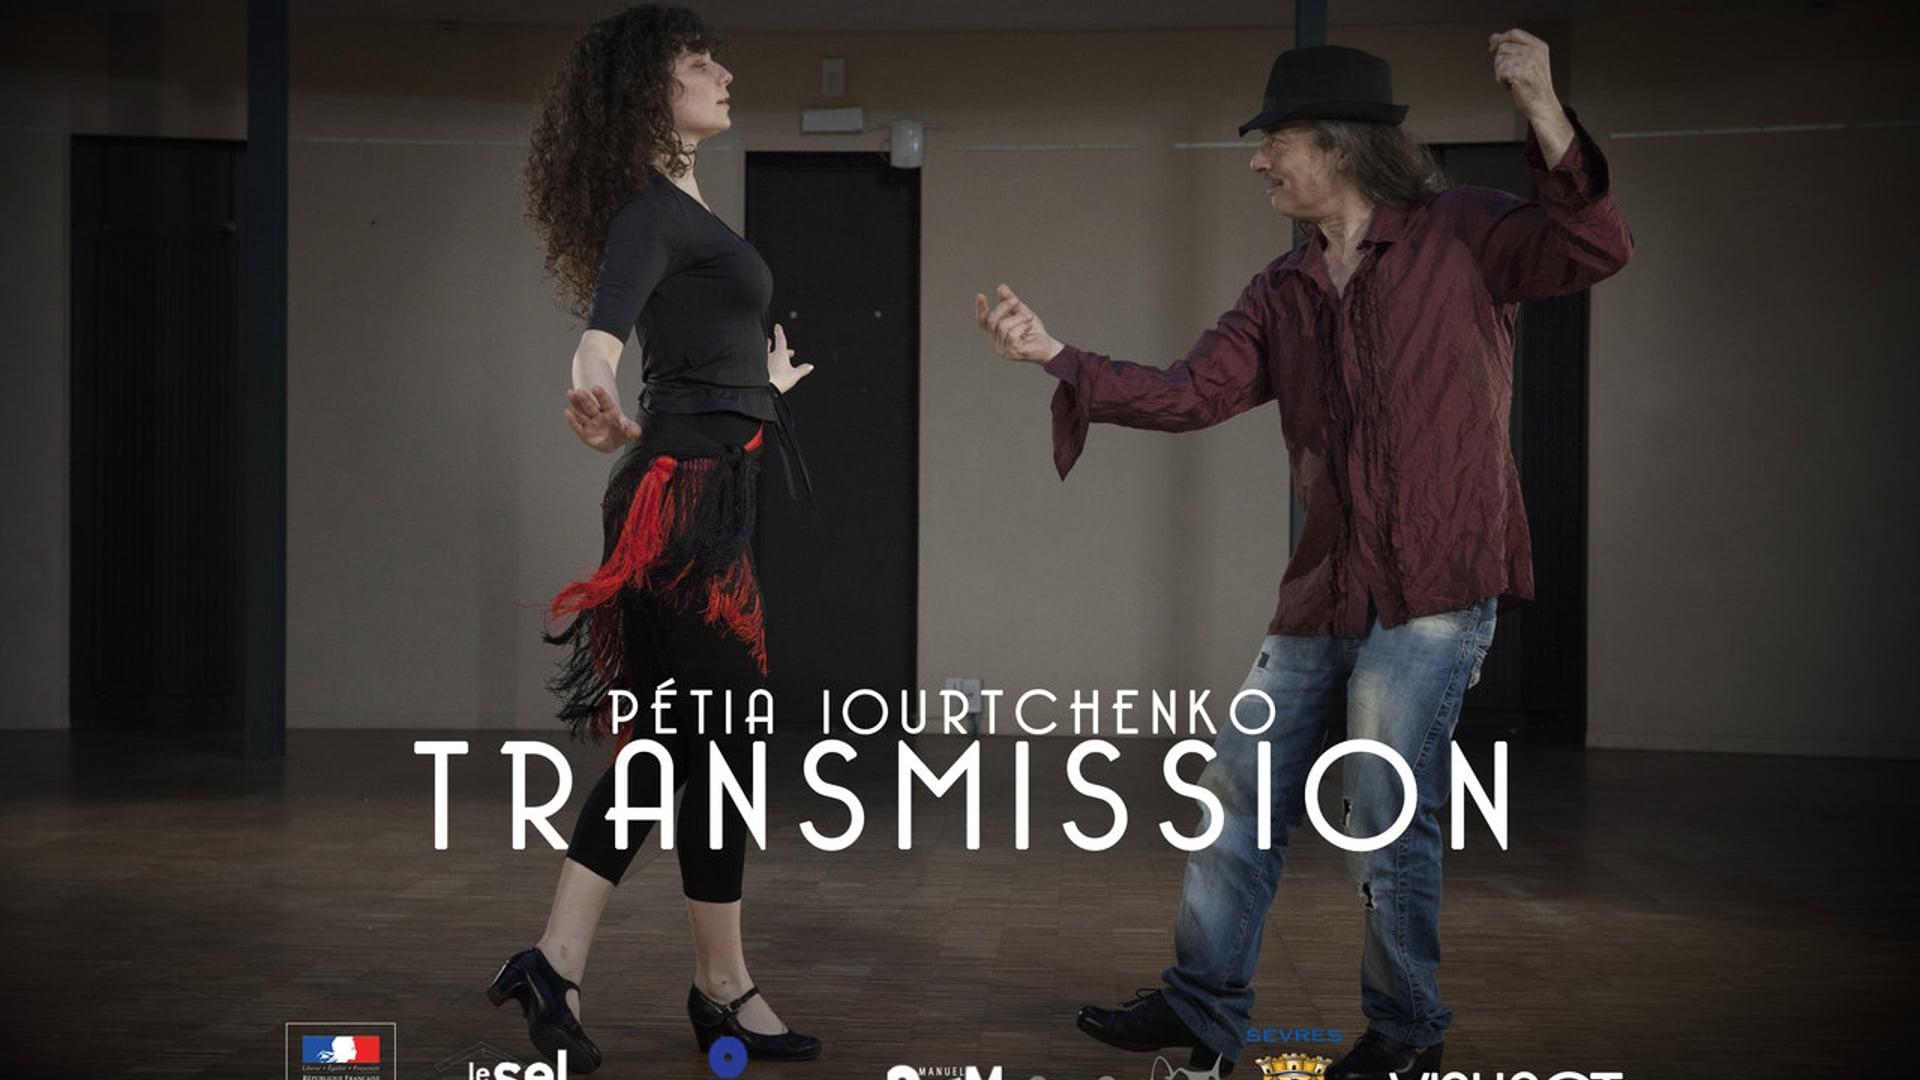 TRANSMISSION - Documentary dance creation